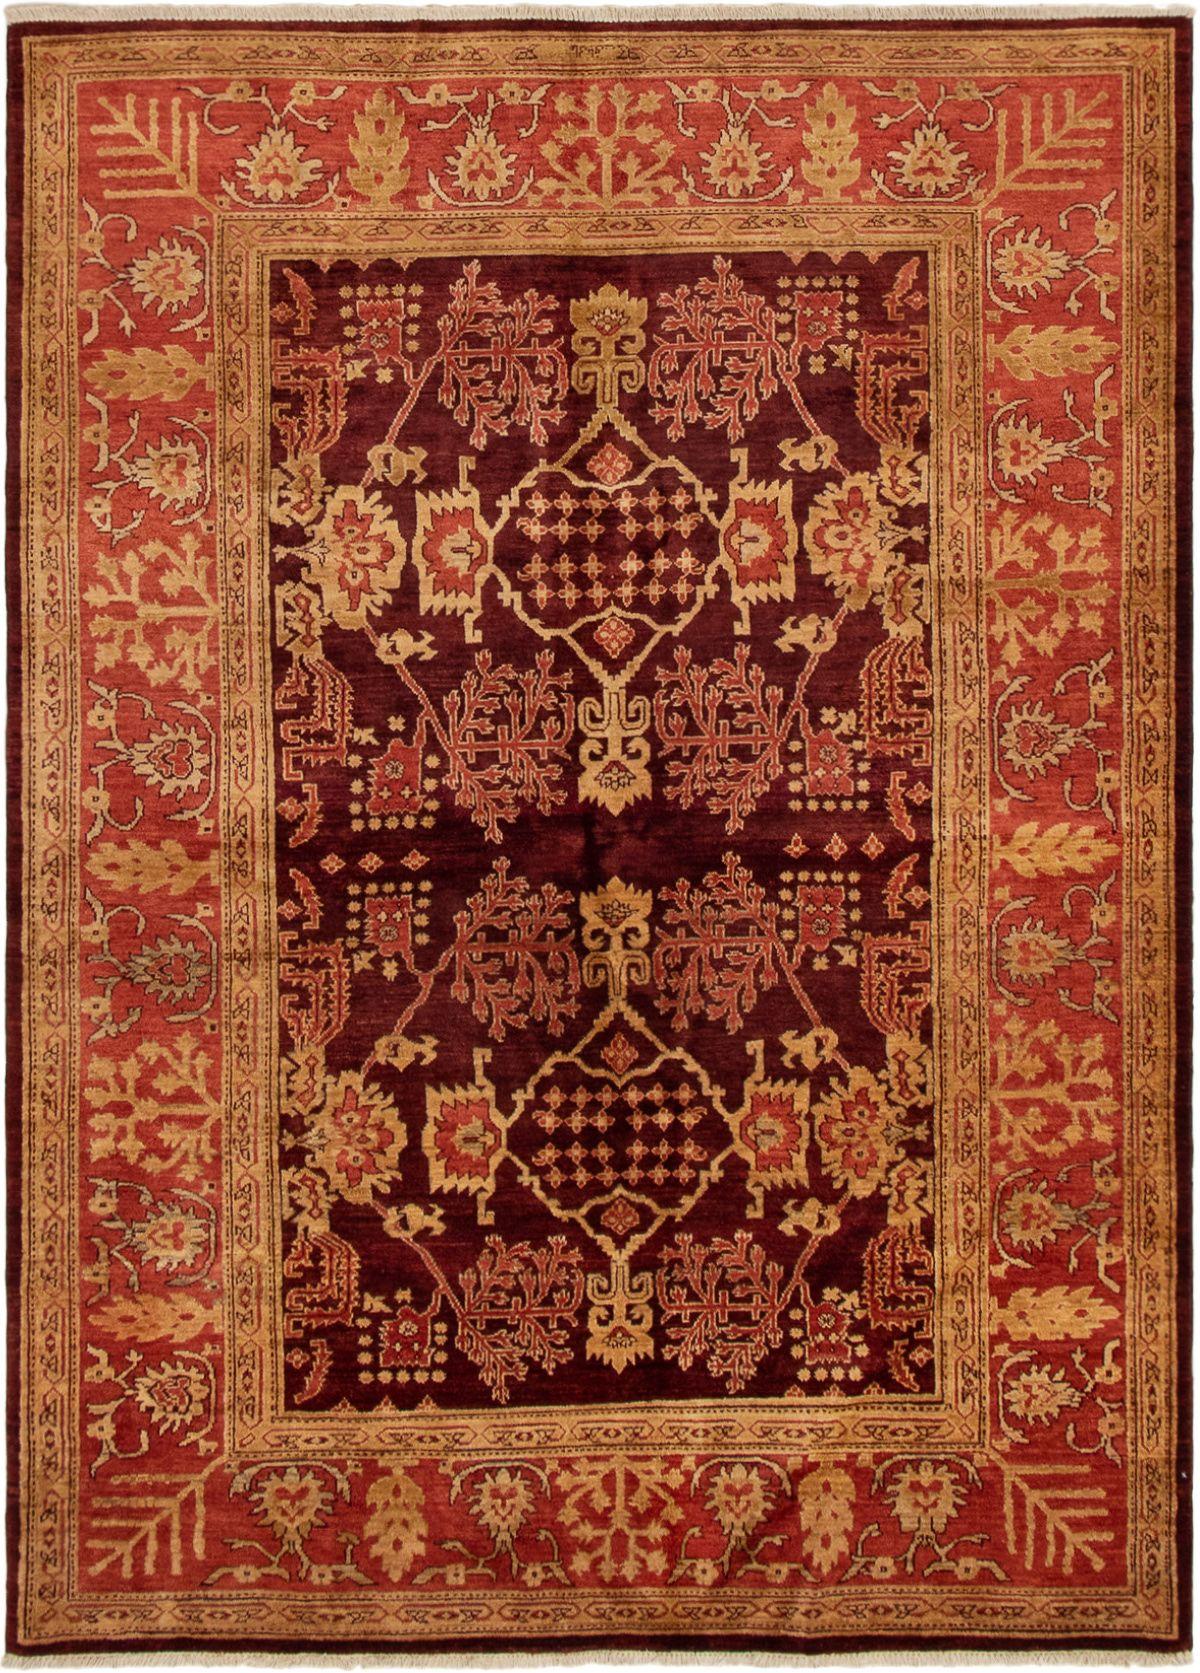 "Hand-knotted Chobi Finest Dark Burgundy Wool Rug 6'3"" x 8'6"" Size: 6'3"" x 8'6"""